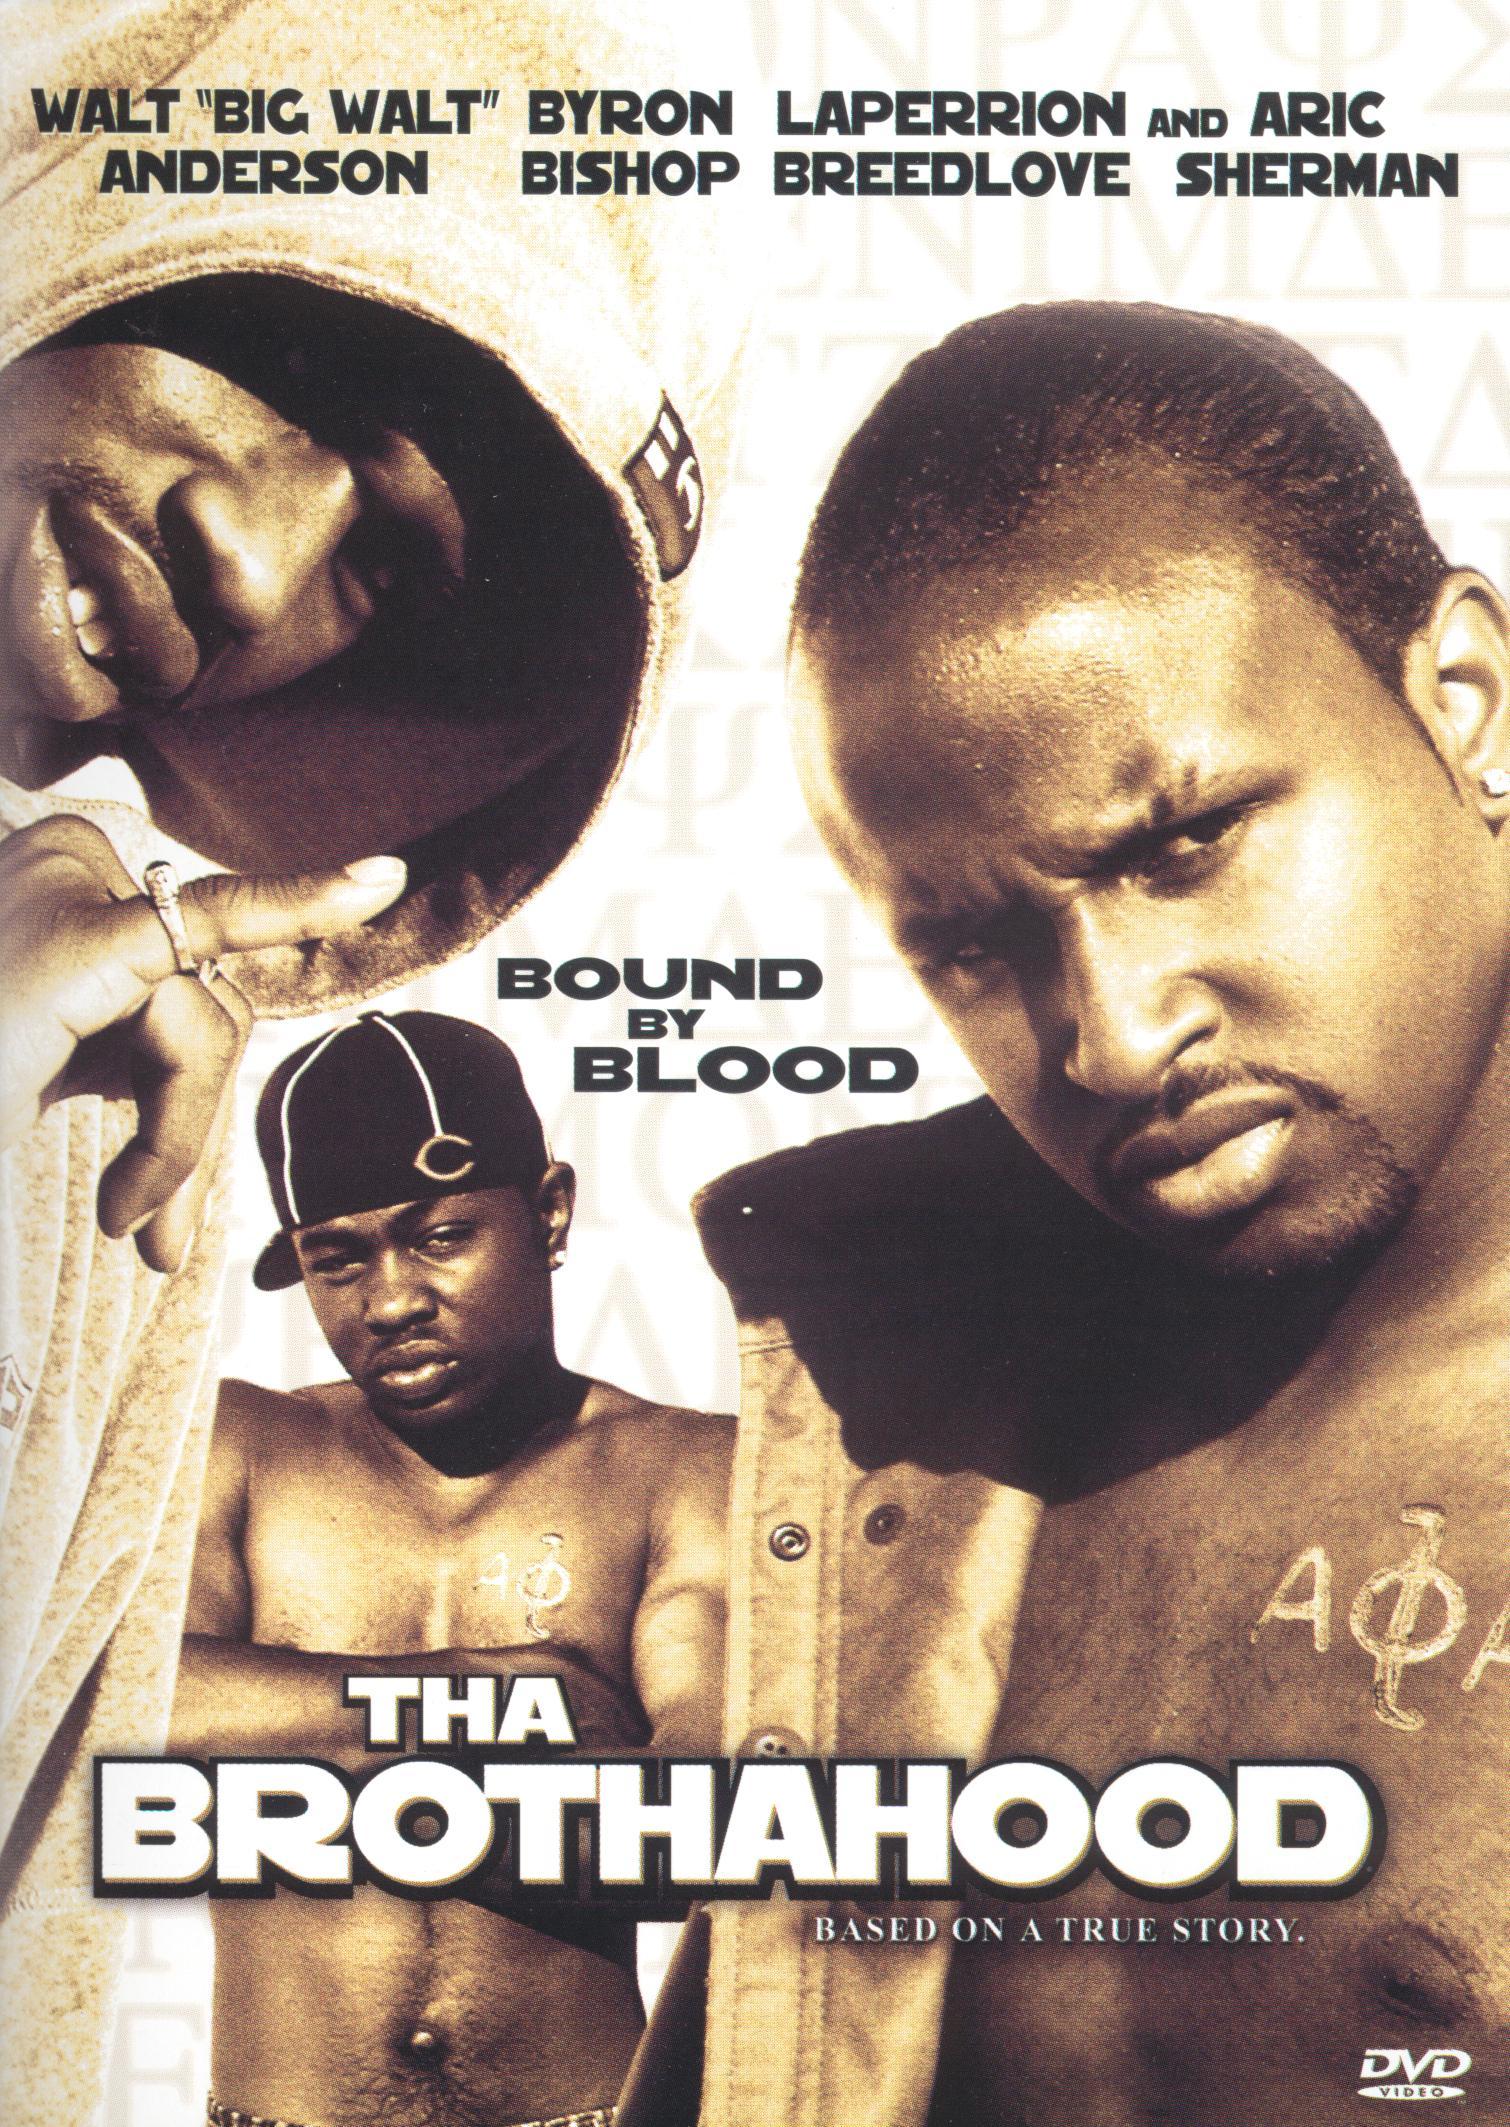 Tha Brothahood